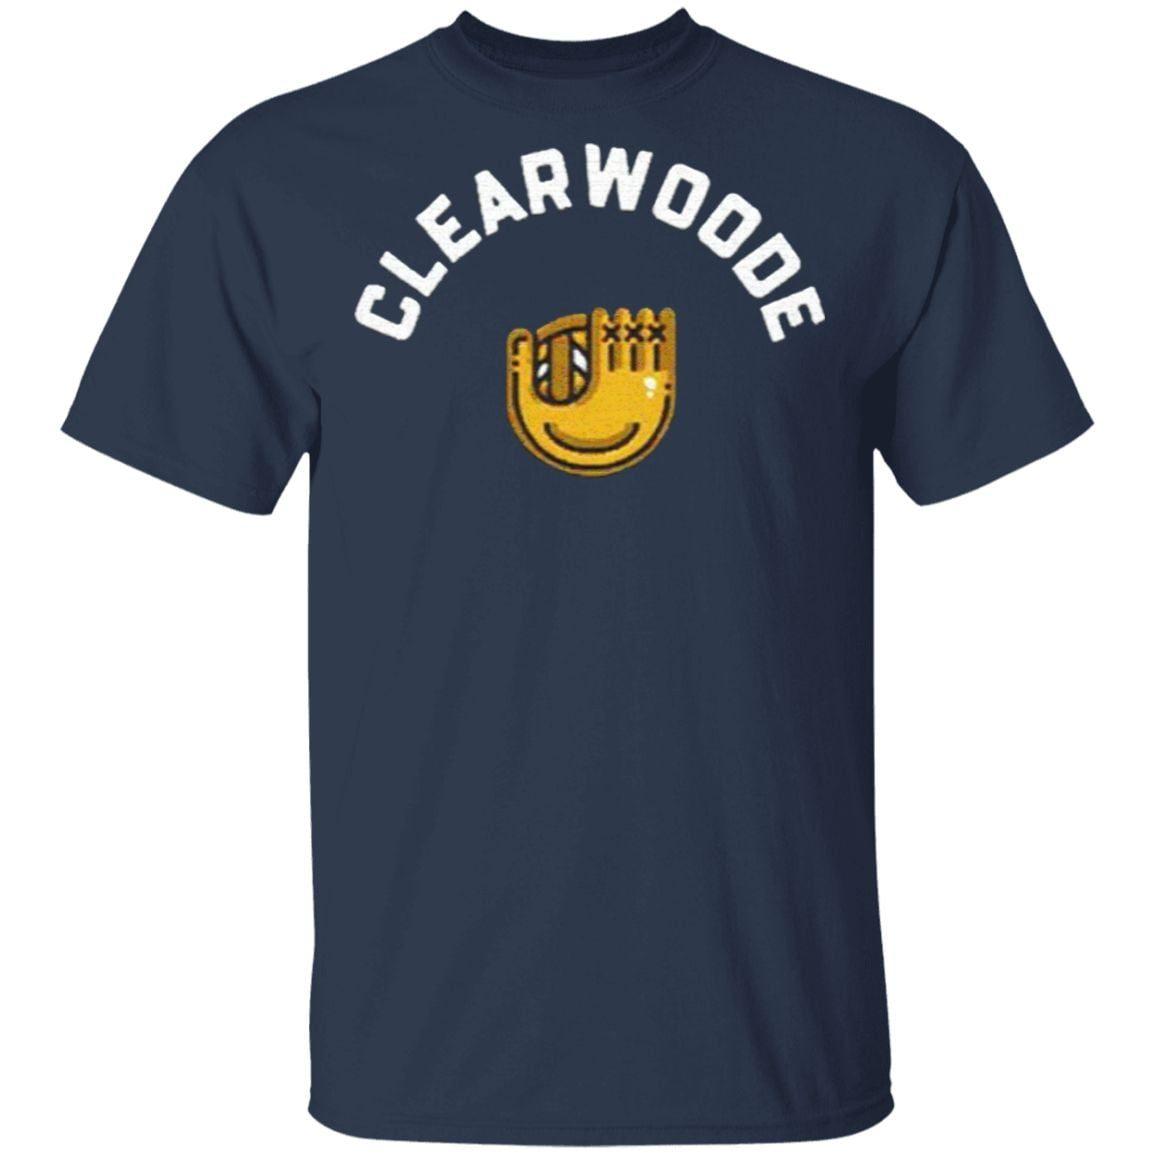 Clearwooder Baseball Philadelphia Phillies T Shirt